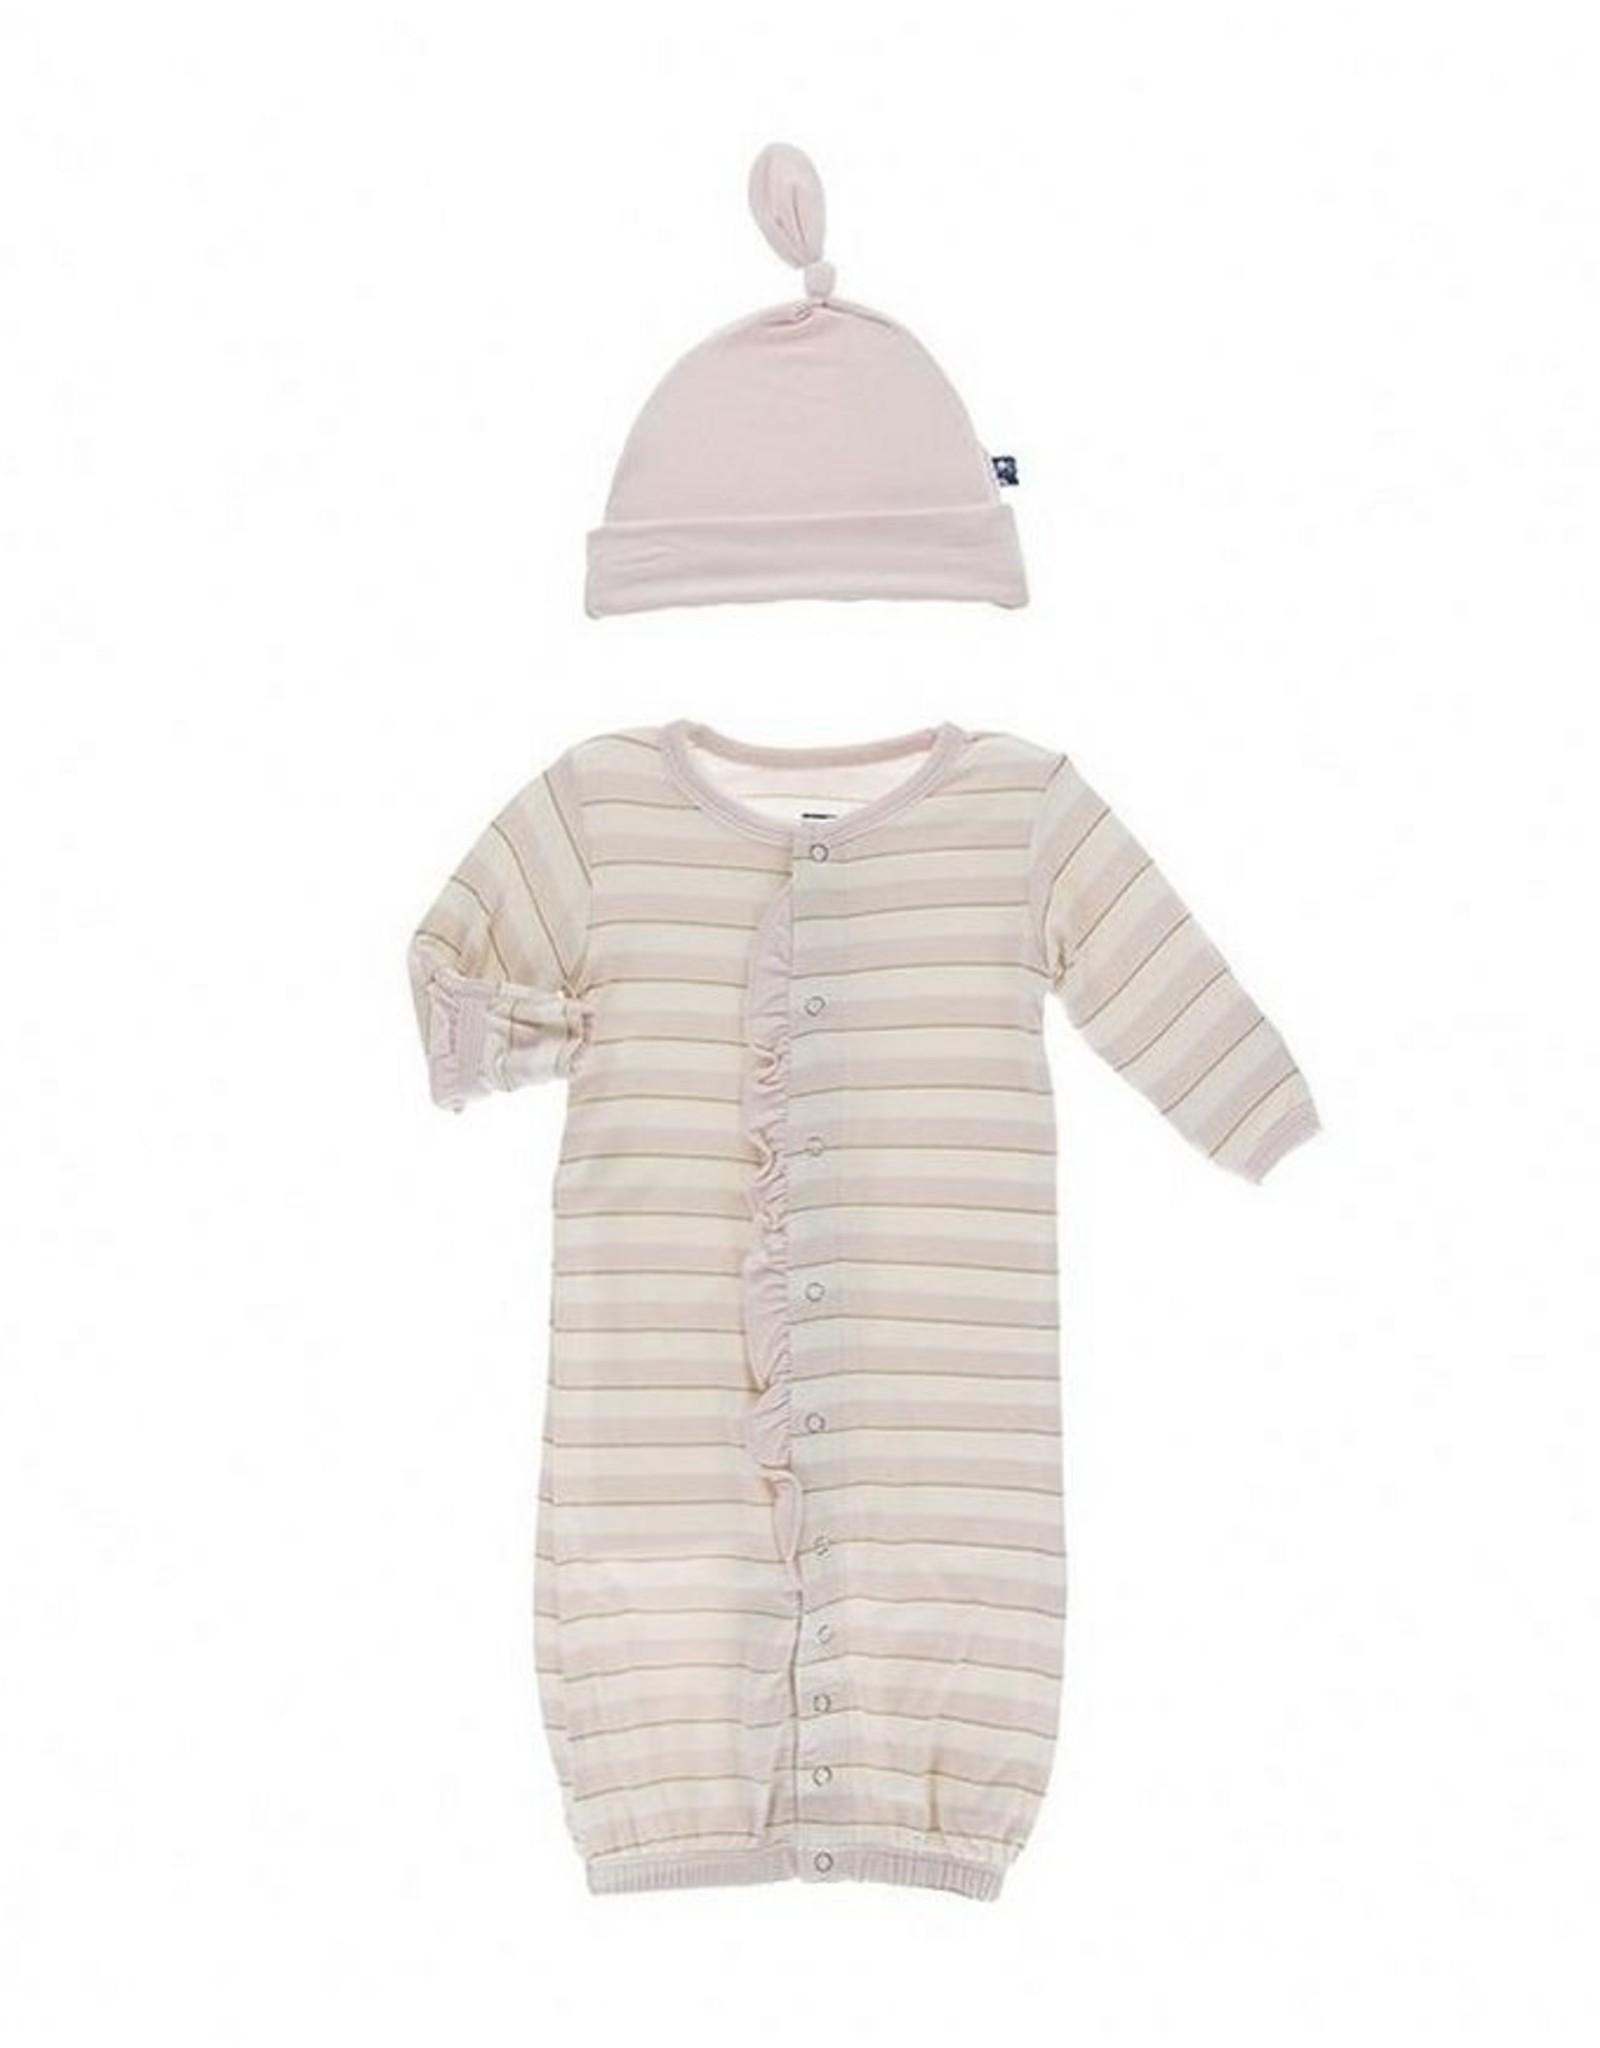 Kic Kee Pants Ruffle Gown &  Knot Hat Set - Sweet Stripe